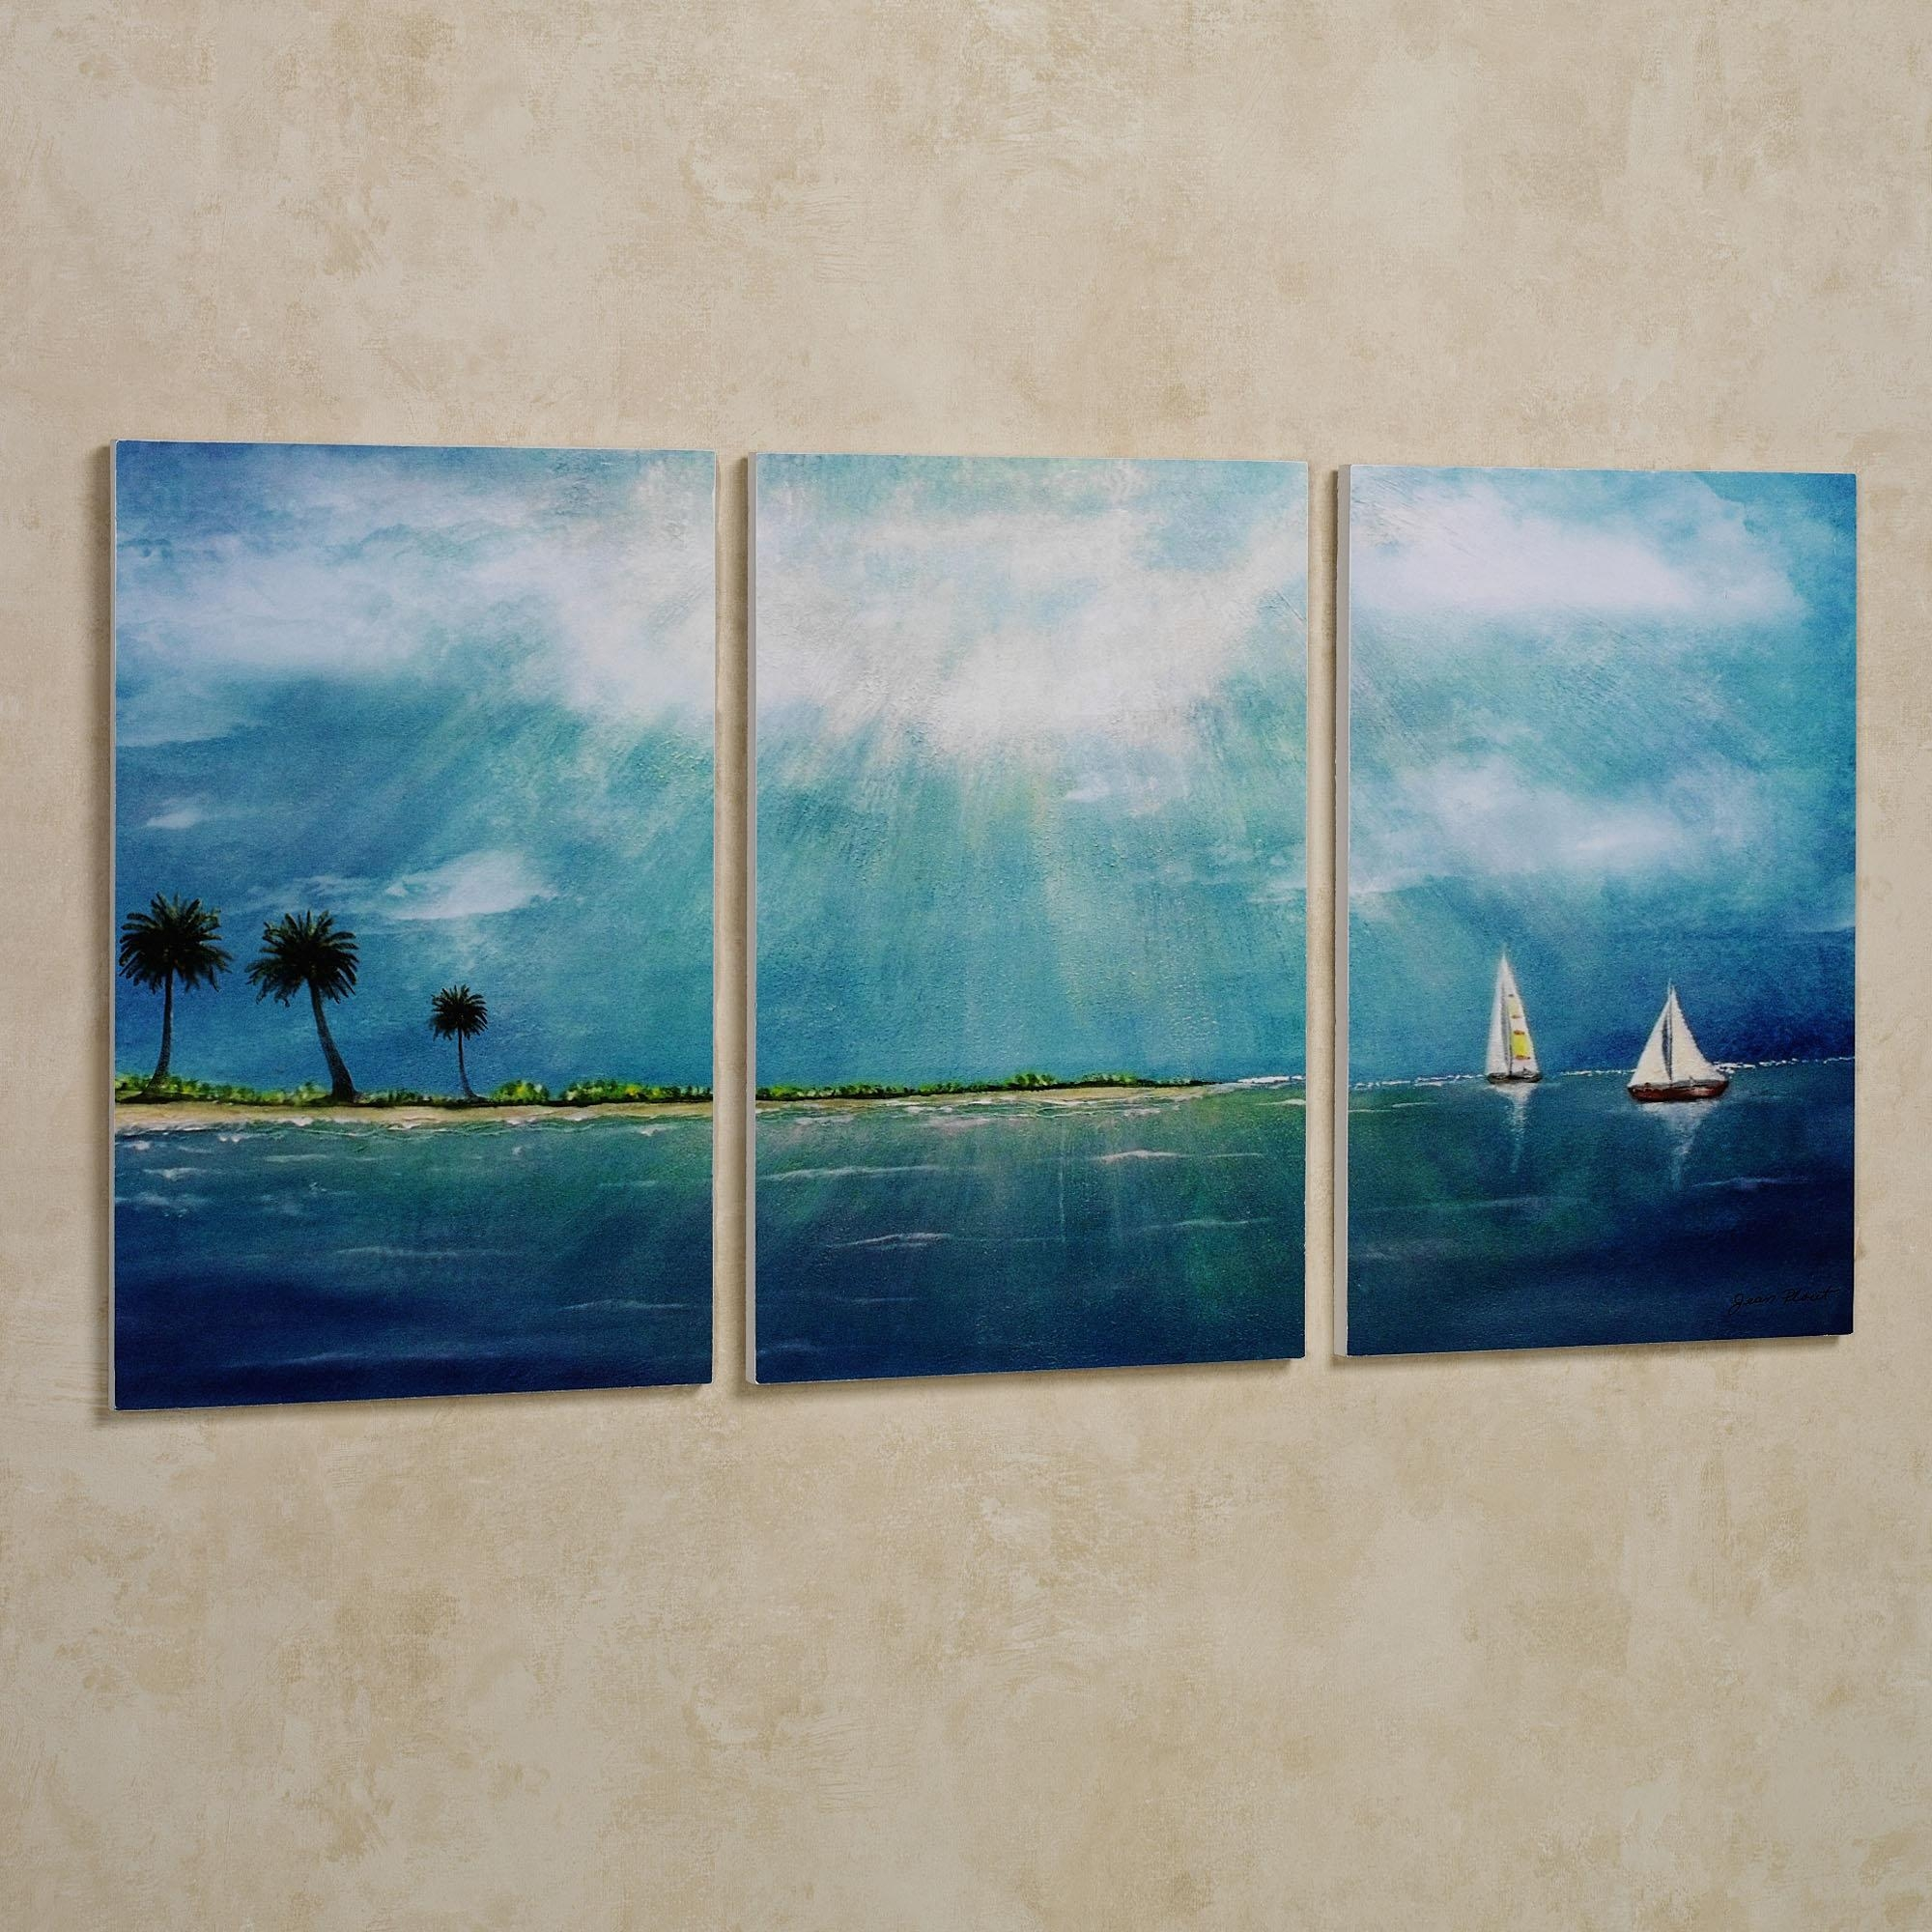 Wall Art Designs: Multi Panel Wall Art Multi Panel Sensual Wall With Regard To Sensual Wall Art (View 13 of 20)